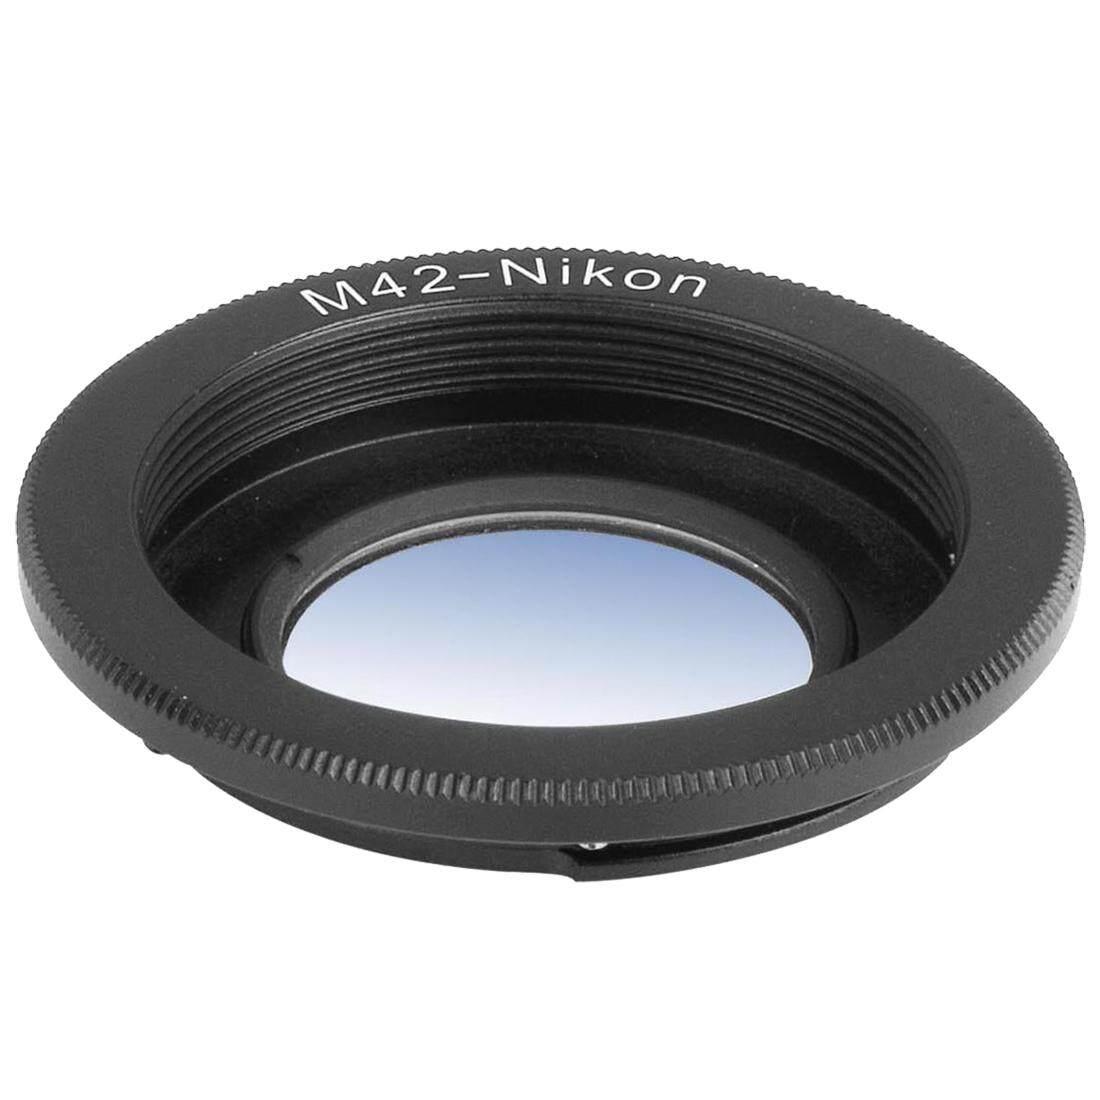 M42 42 Mm Lensa Adaptor Dudukan untuk Nikon D3100 D3000 D5000 Infinity Fokus DC305-Intl